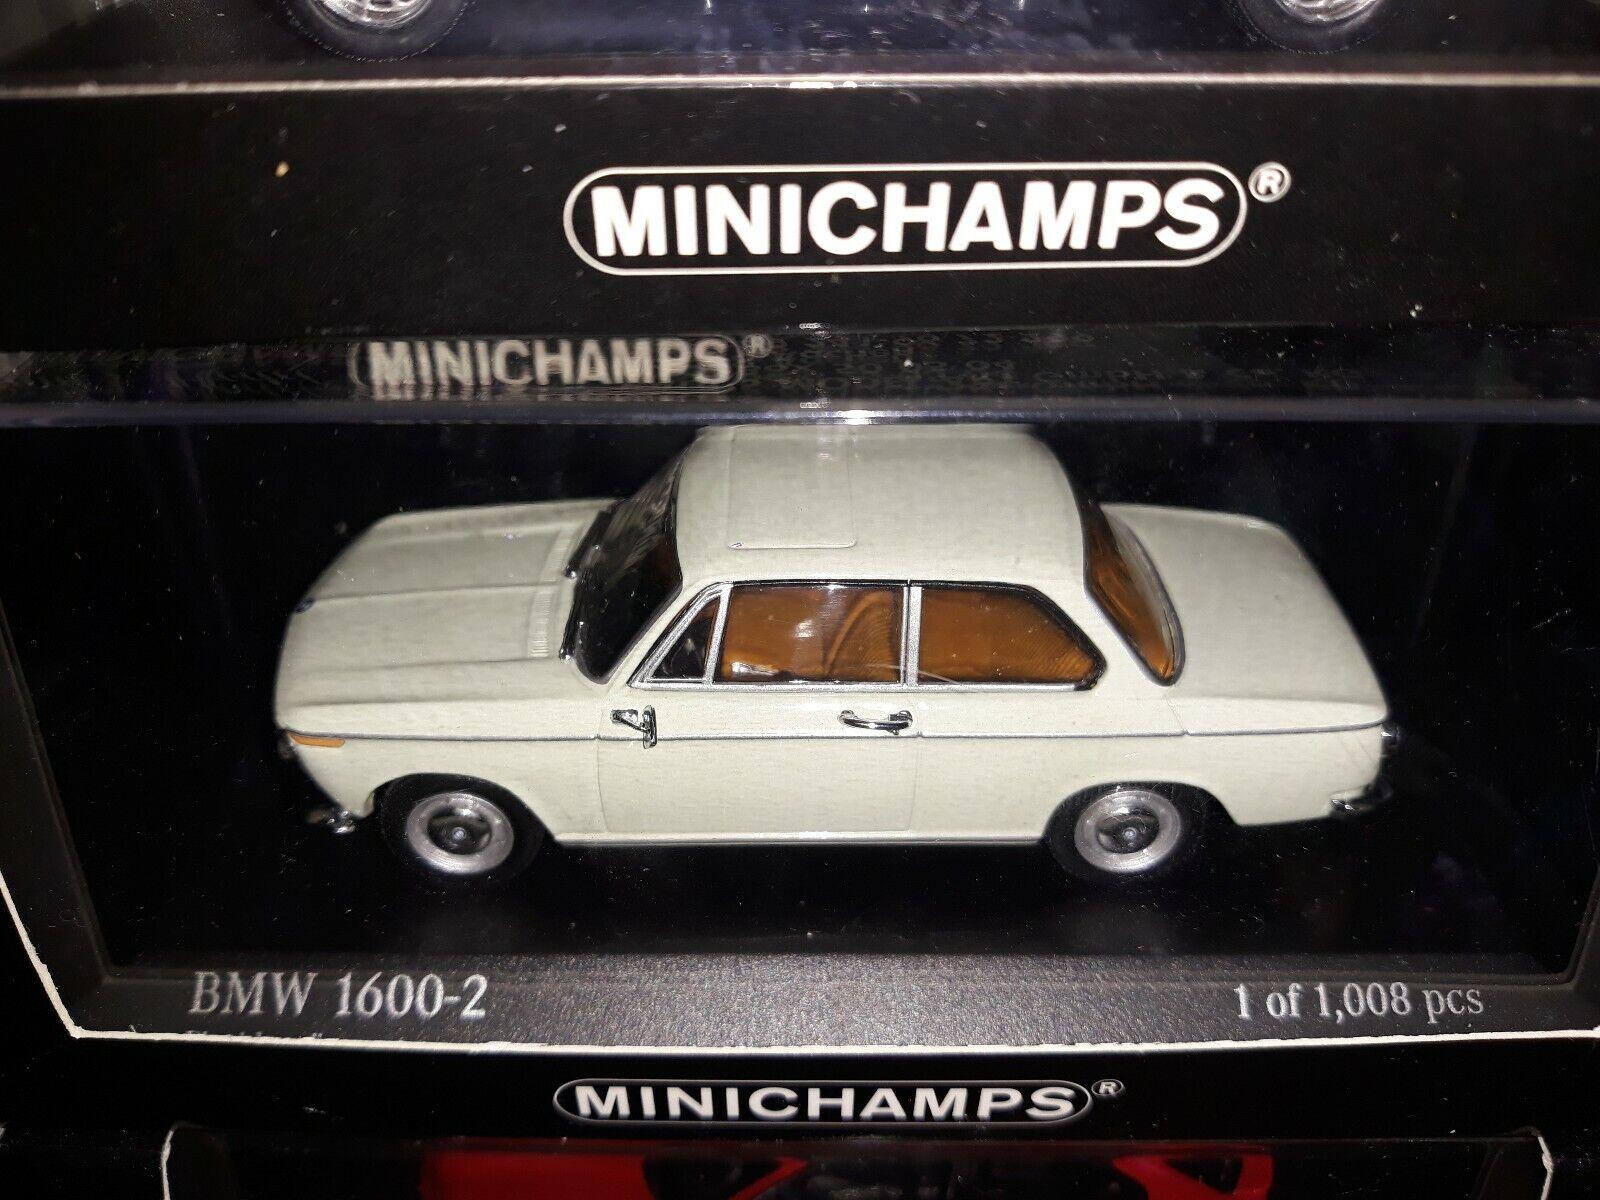 Minichamps 1 43 BMW 1600-2 1966 floridagrun